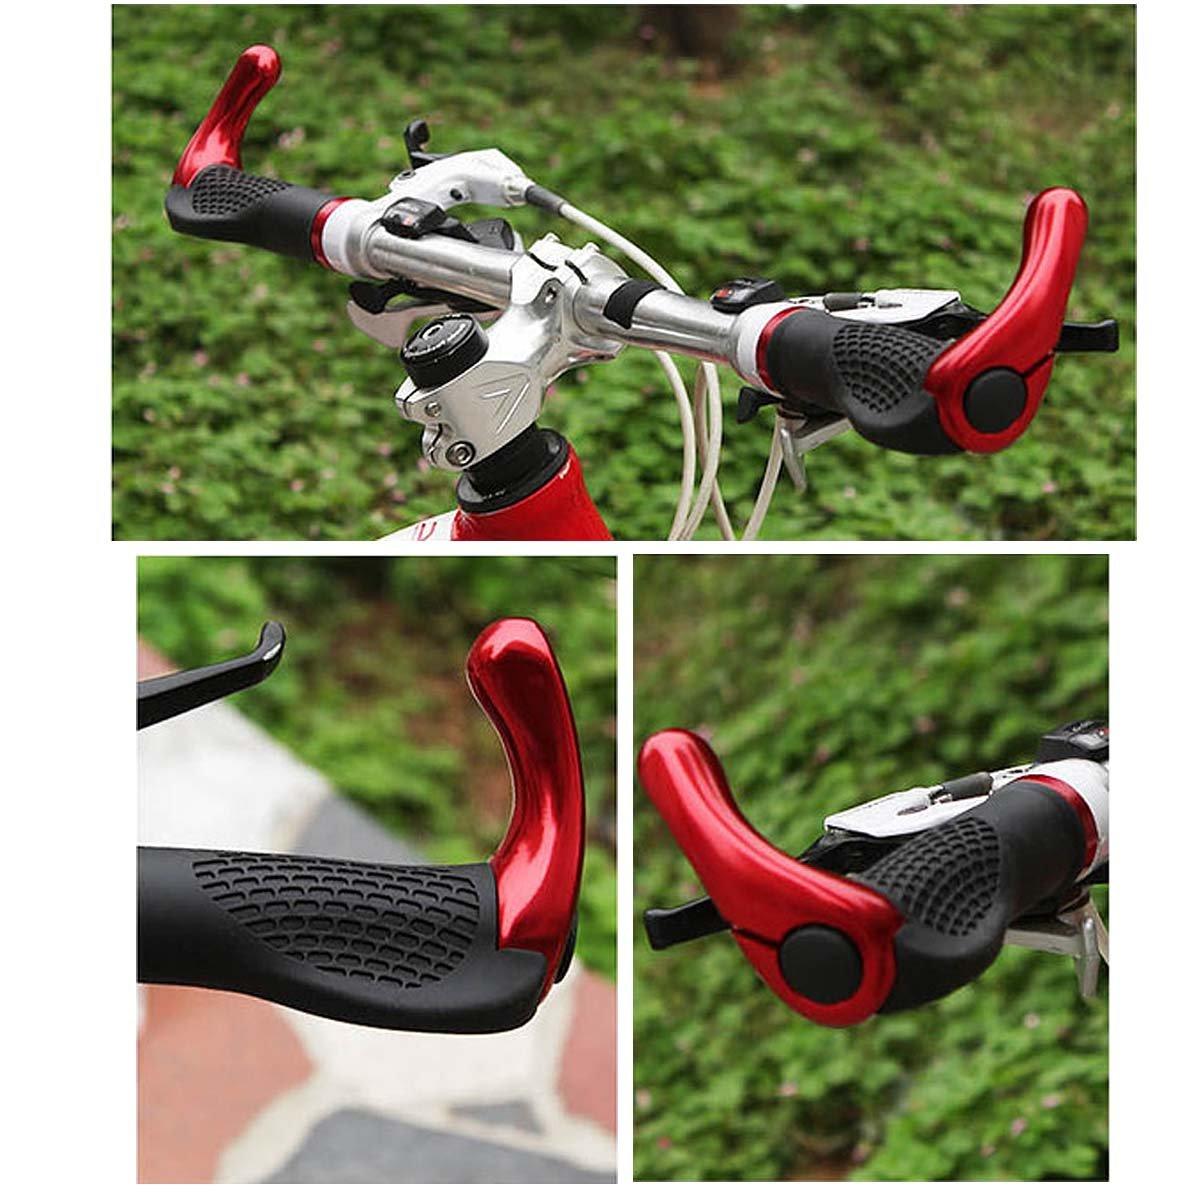 Kenthia Anti-slip Rubber Aluminum Alloy Bicycle Handlebar Grips Human Mechanics Design Black by Kenthia (Image #5)